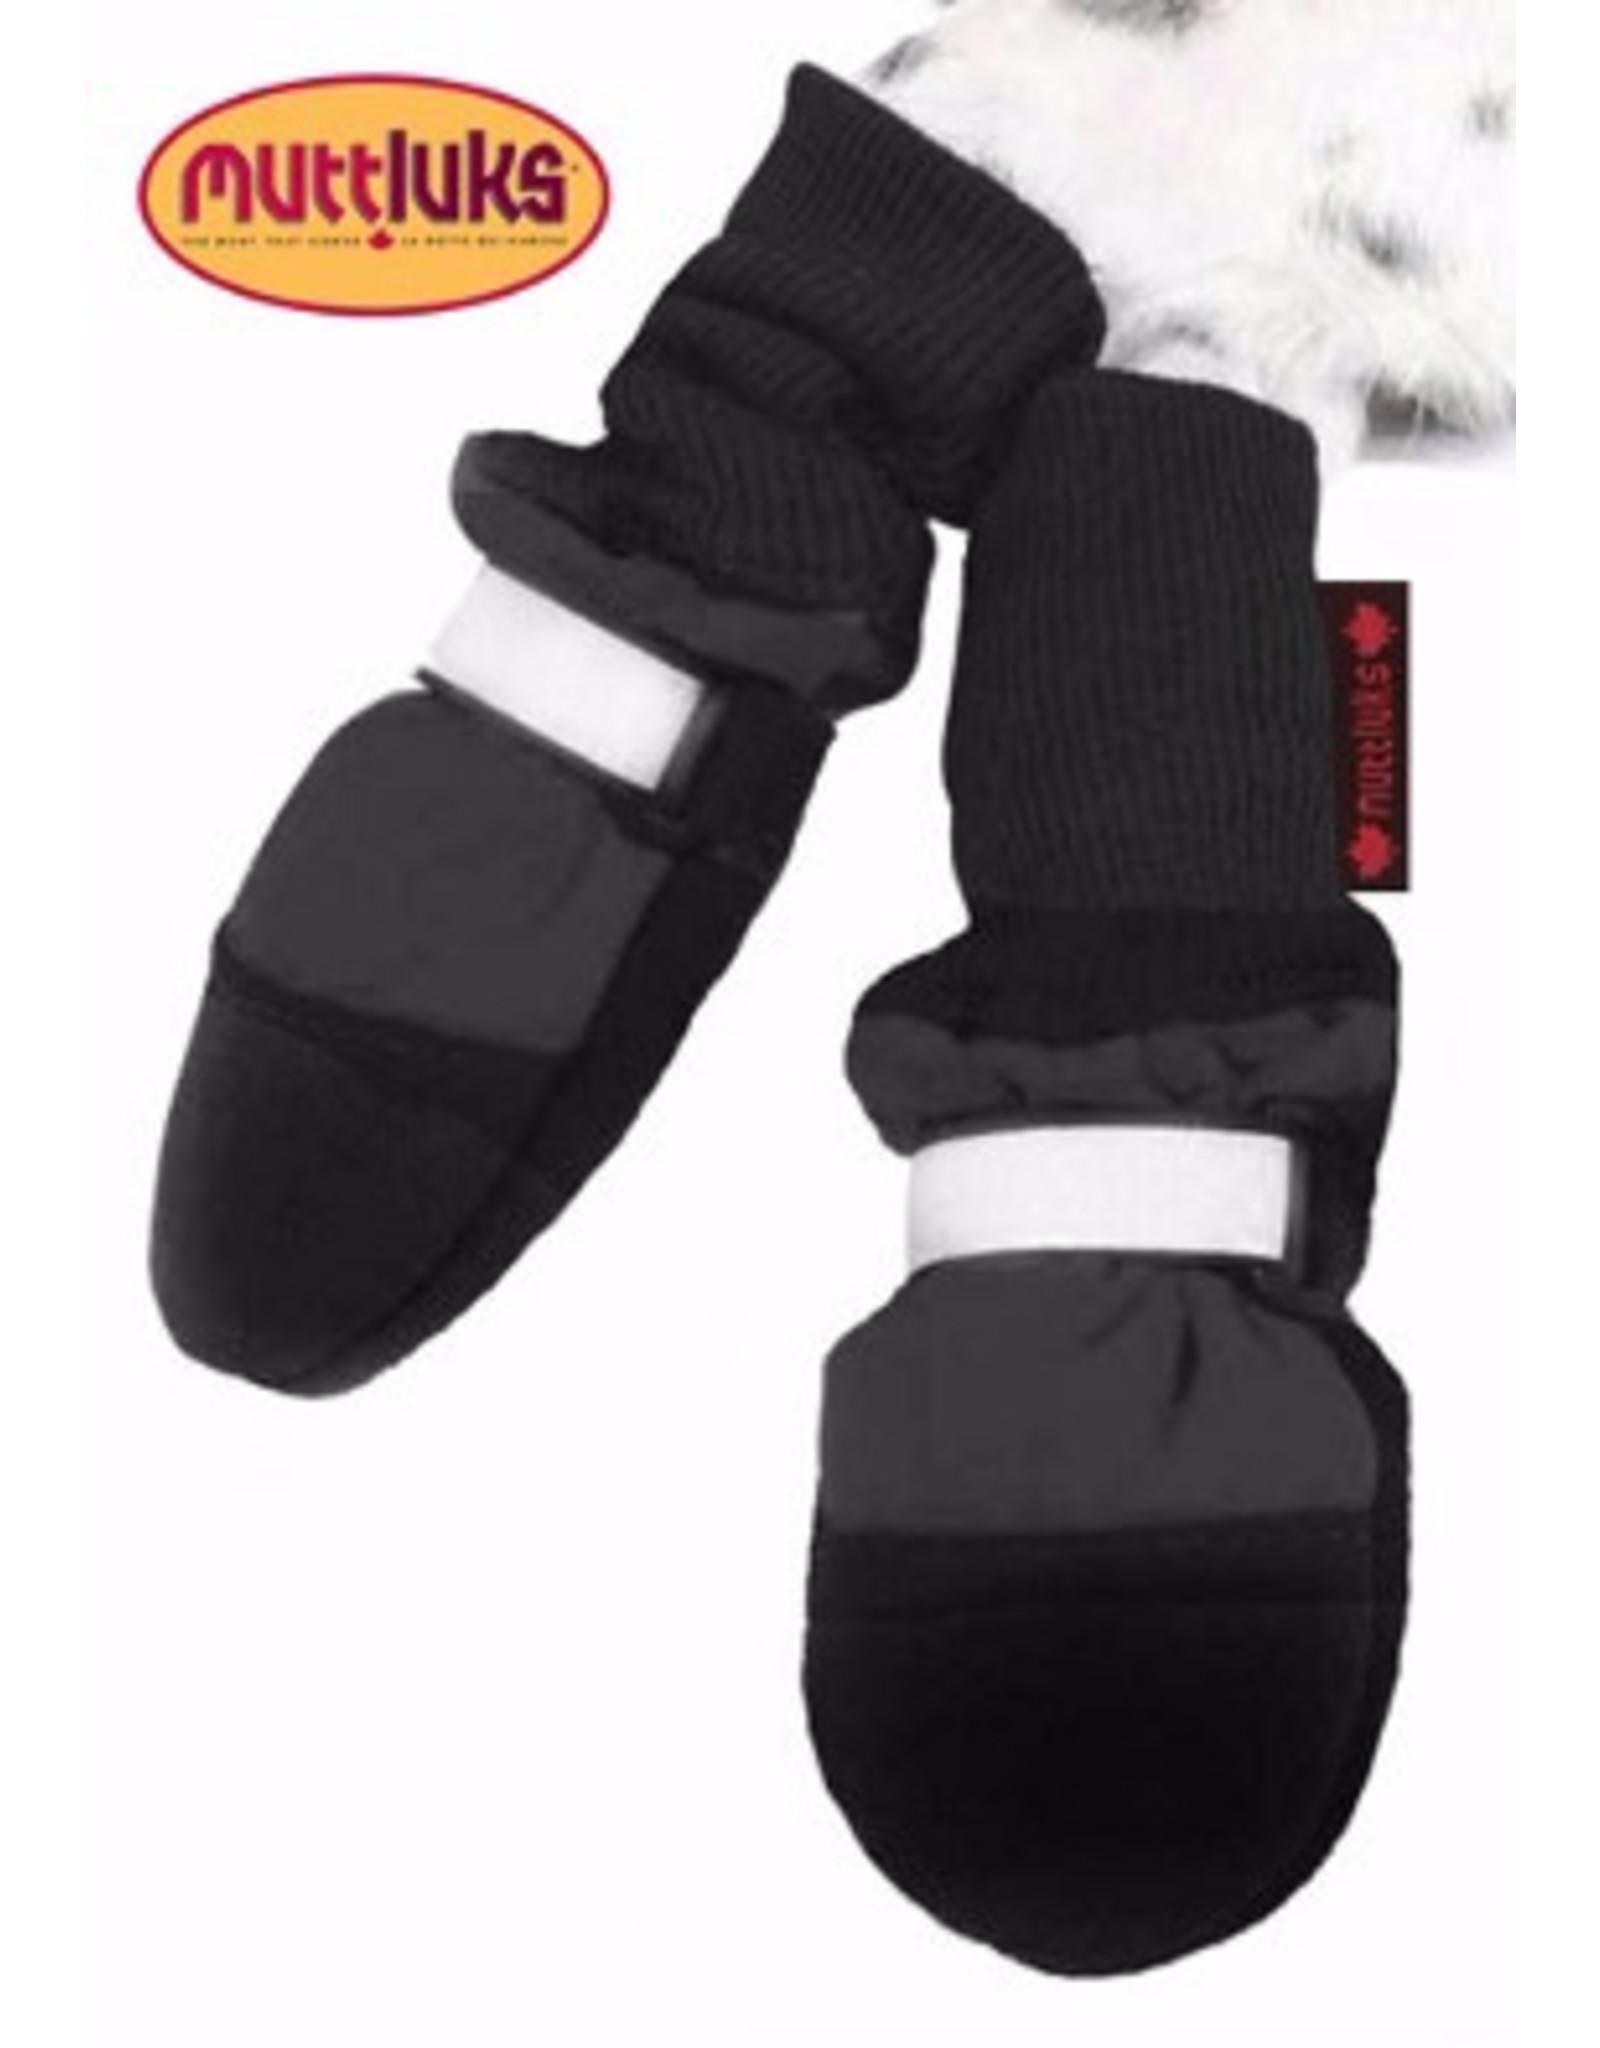 Muttluks Muttluks Black xlg Boots Fleece  Lined EA